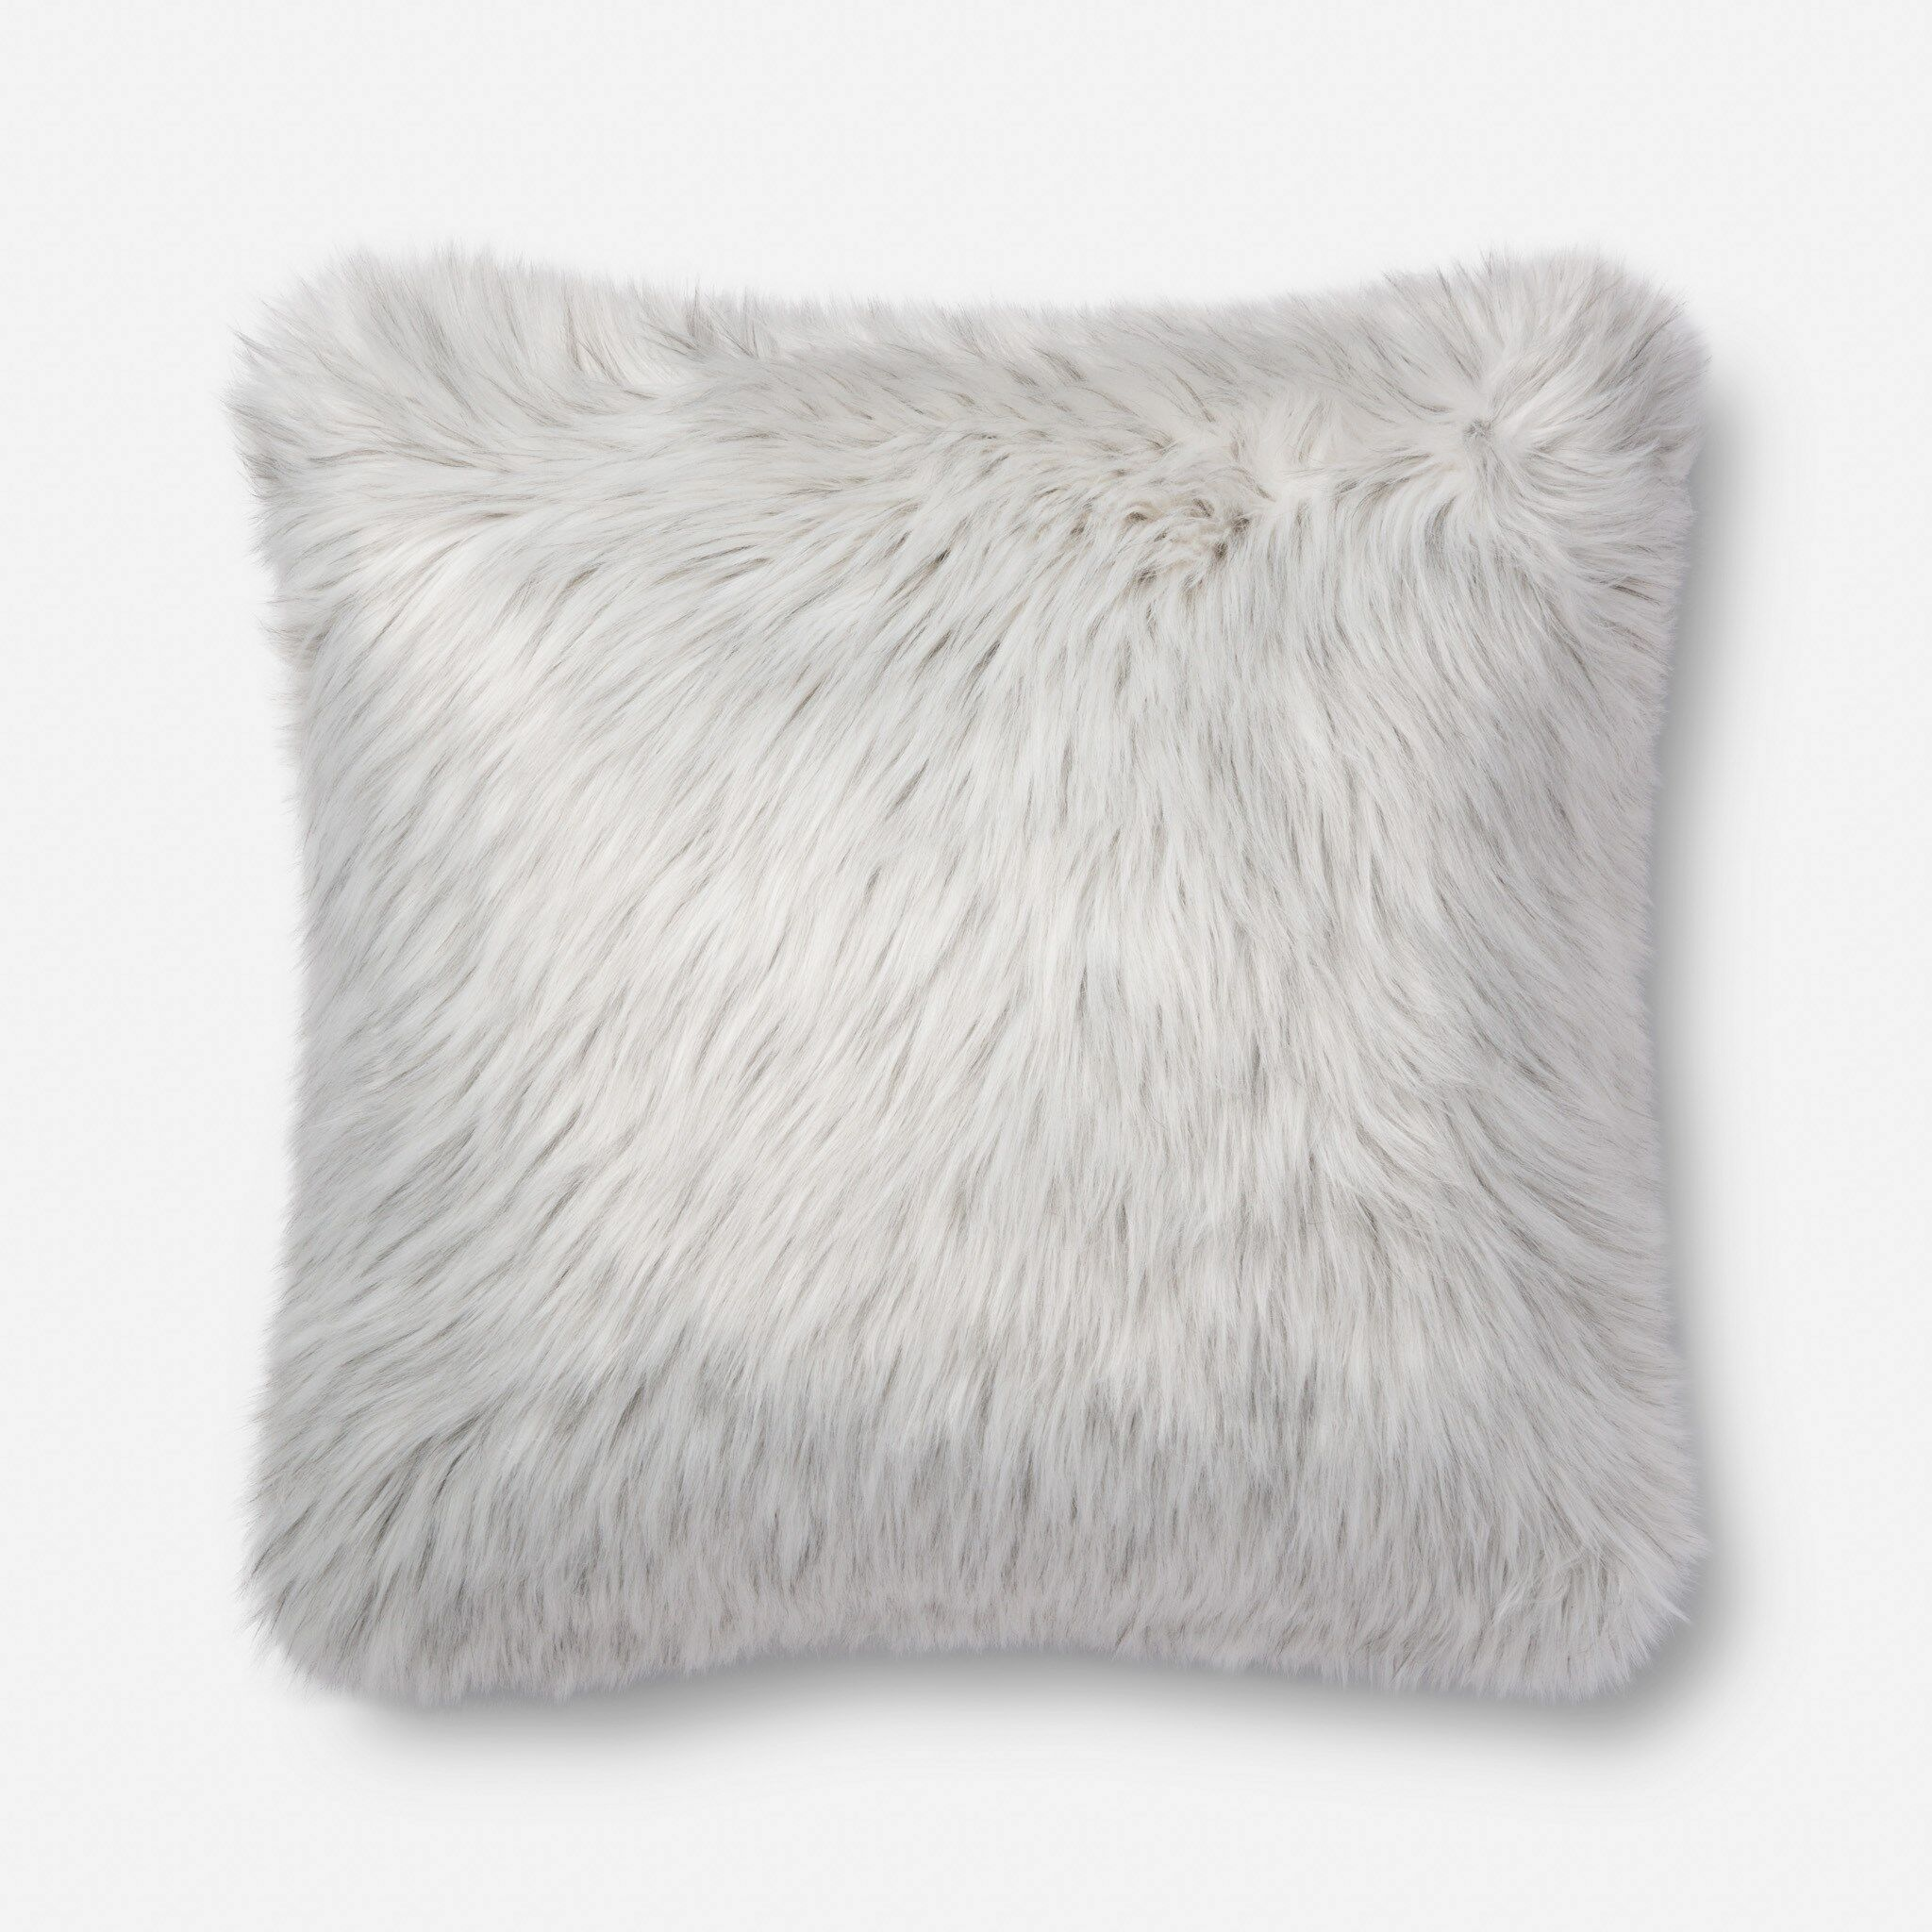 Candleick Pillow Fill Material: Polyester/Polyfill